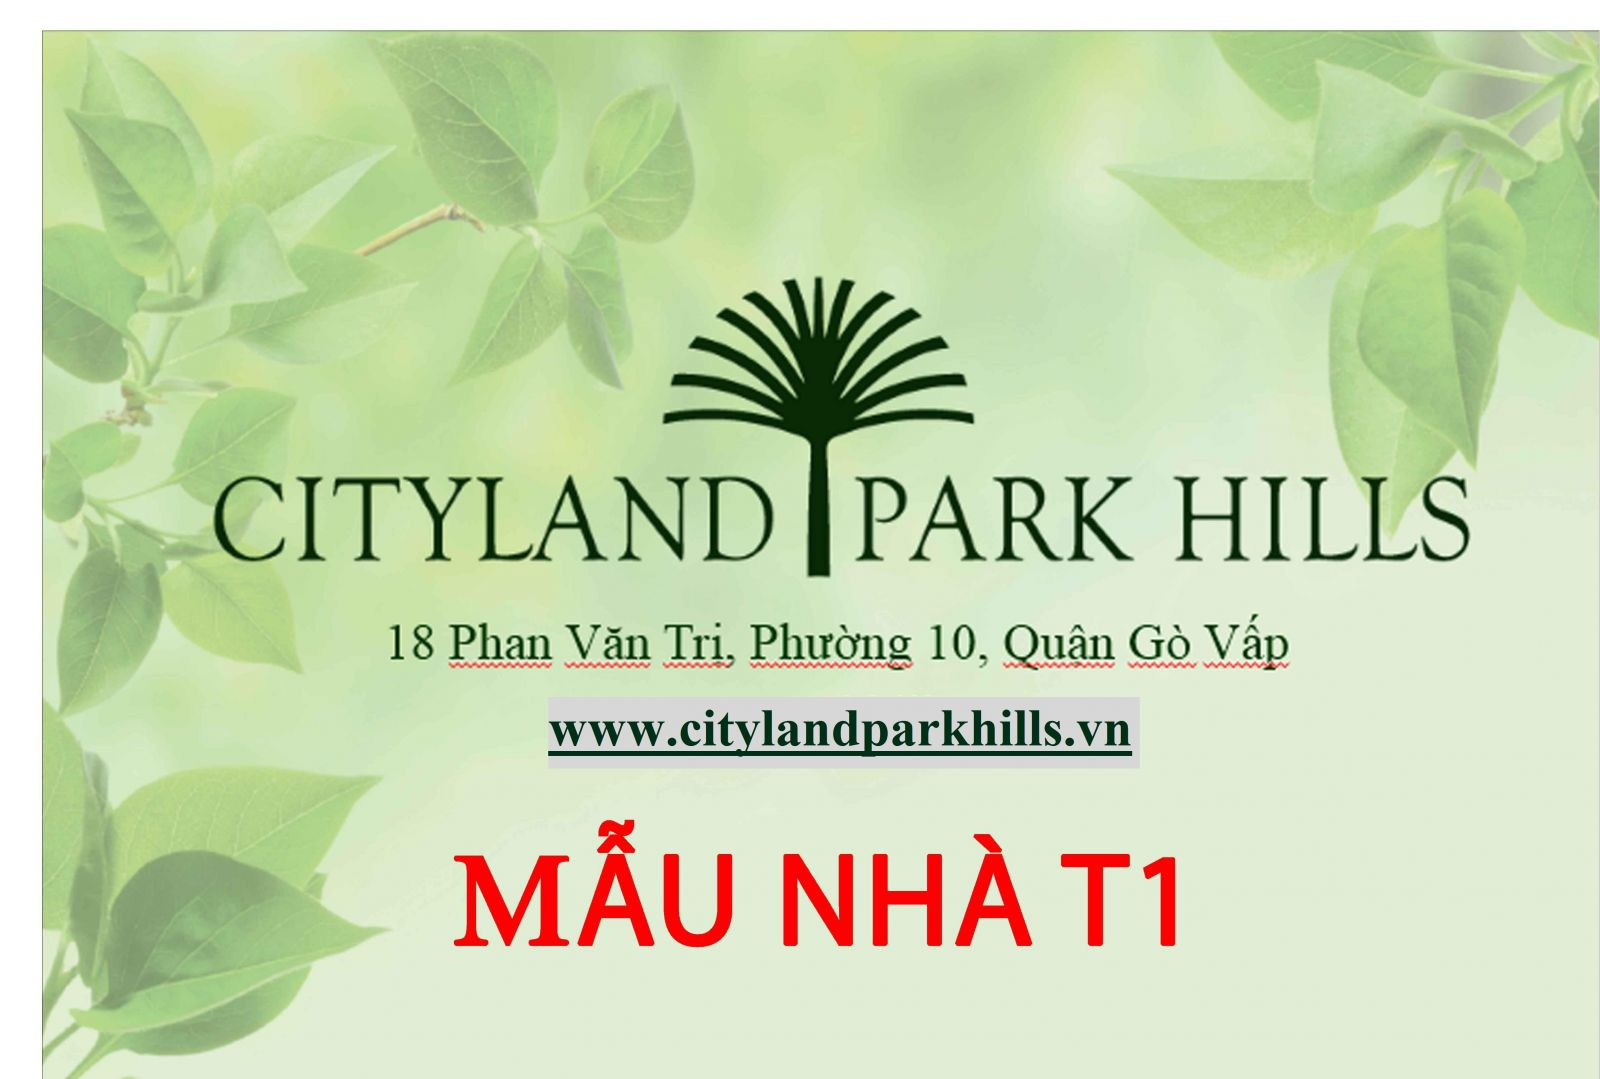 Cityland park hills mau T1